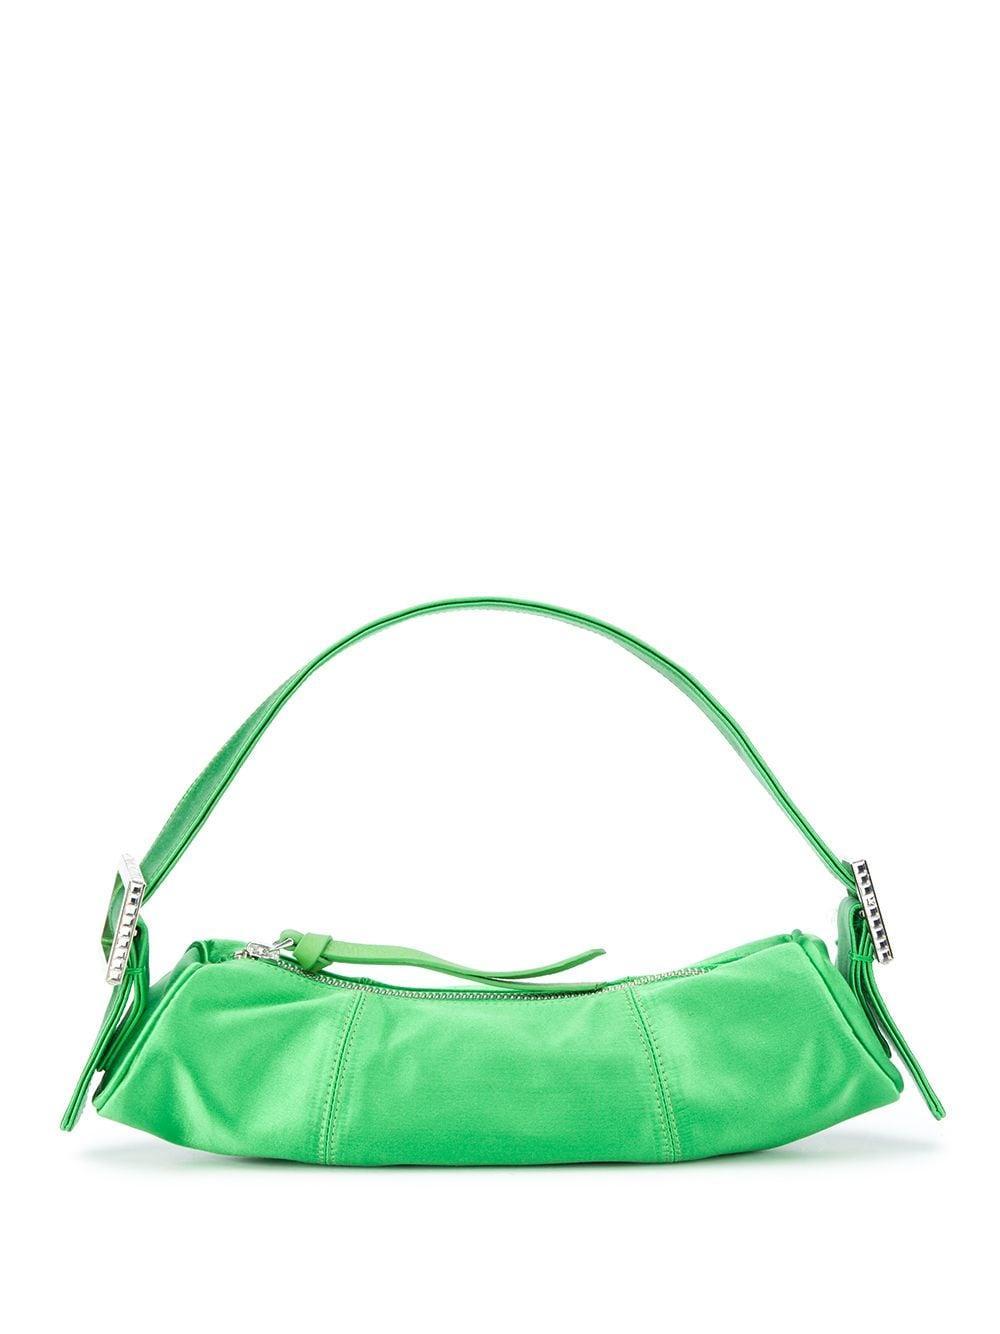 Kubi Silk Mini Bag Item # 20FWKUSKGSMED